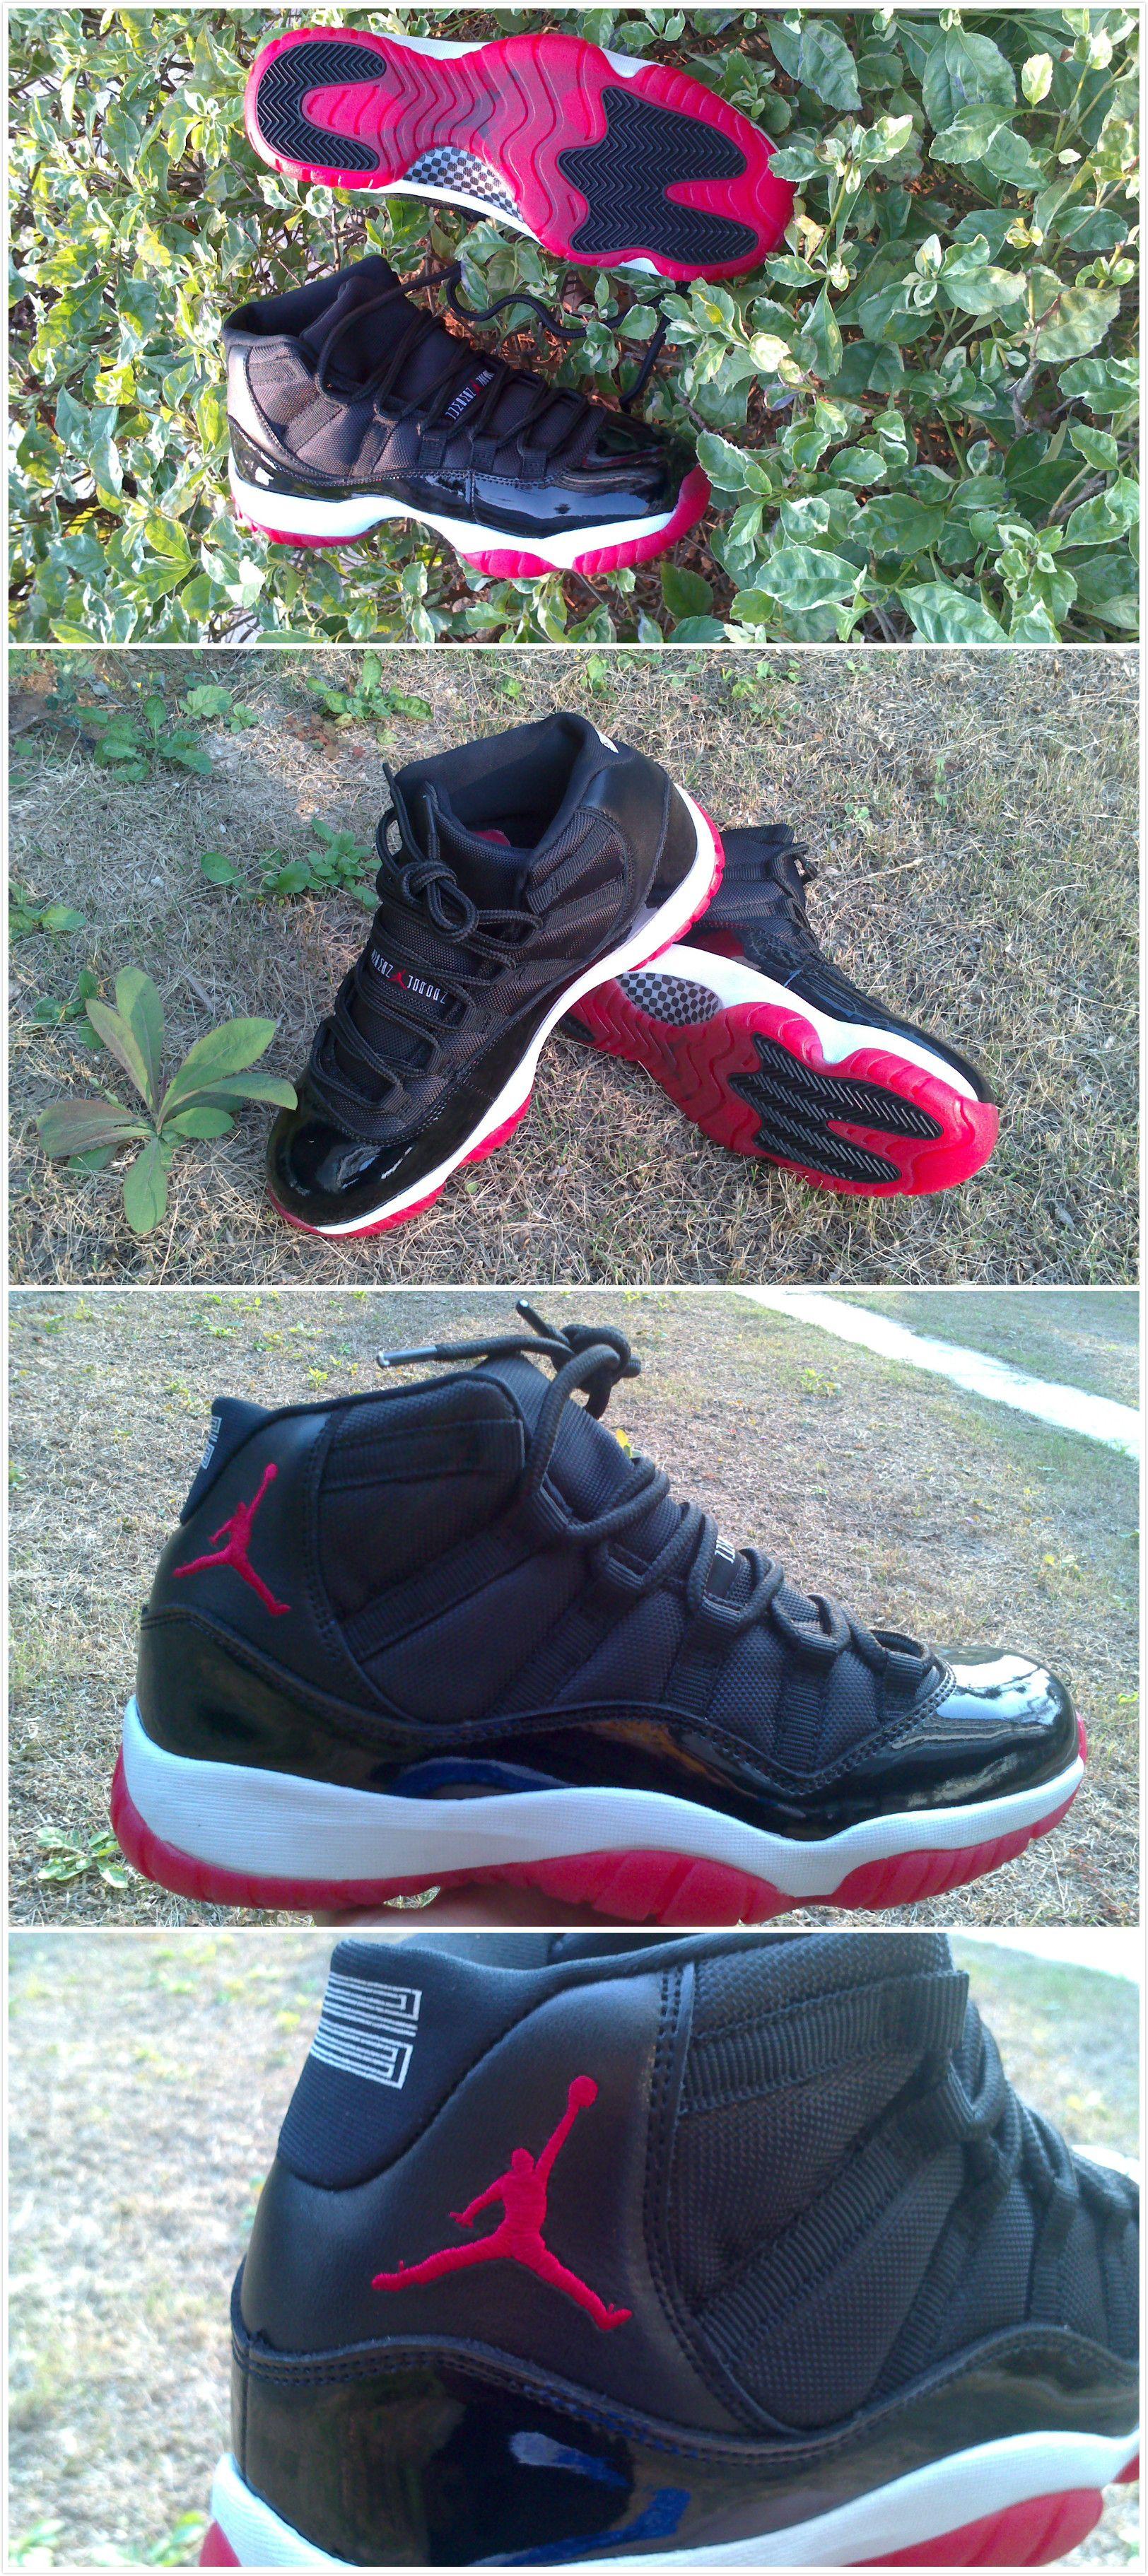 Air Jordan 11 Bred Shoes *Cheap Nike Shoes*